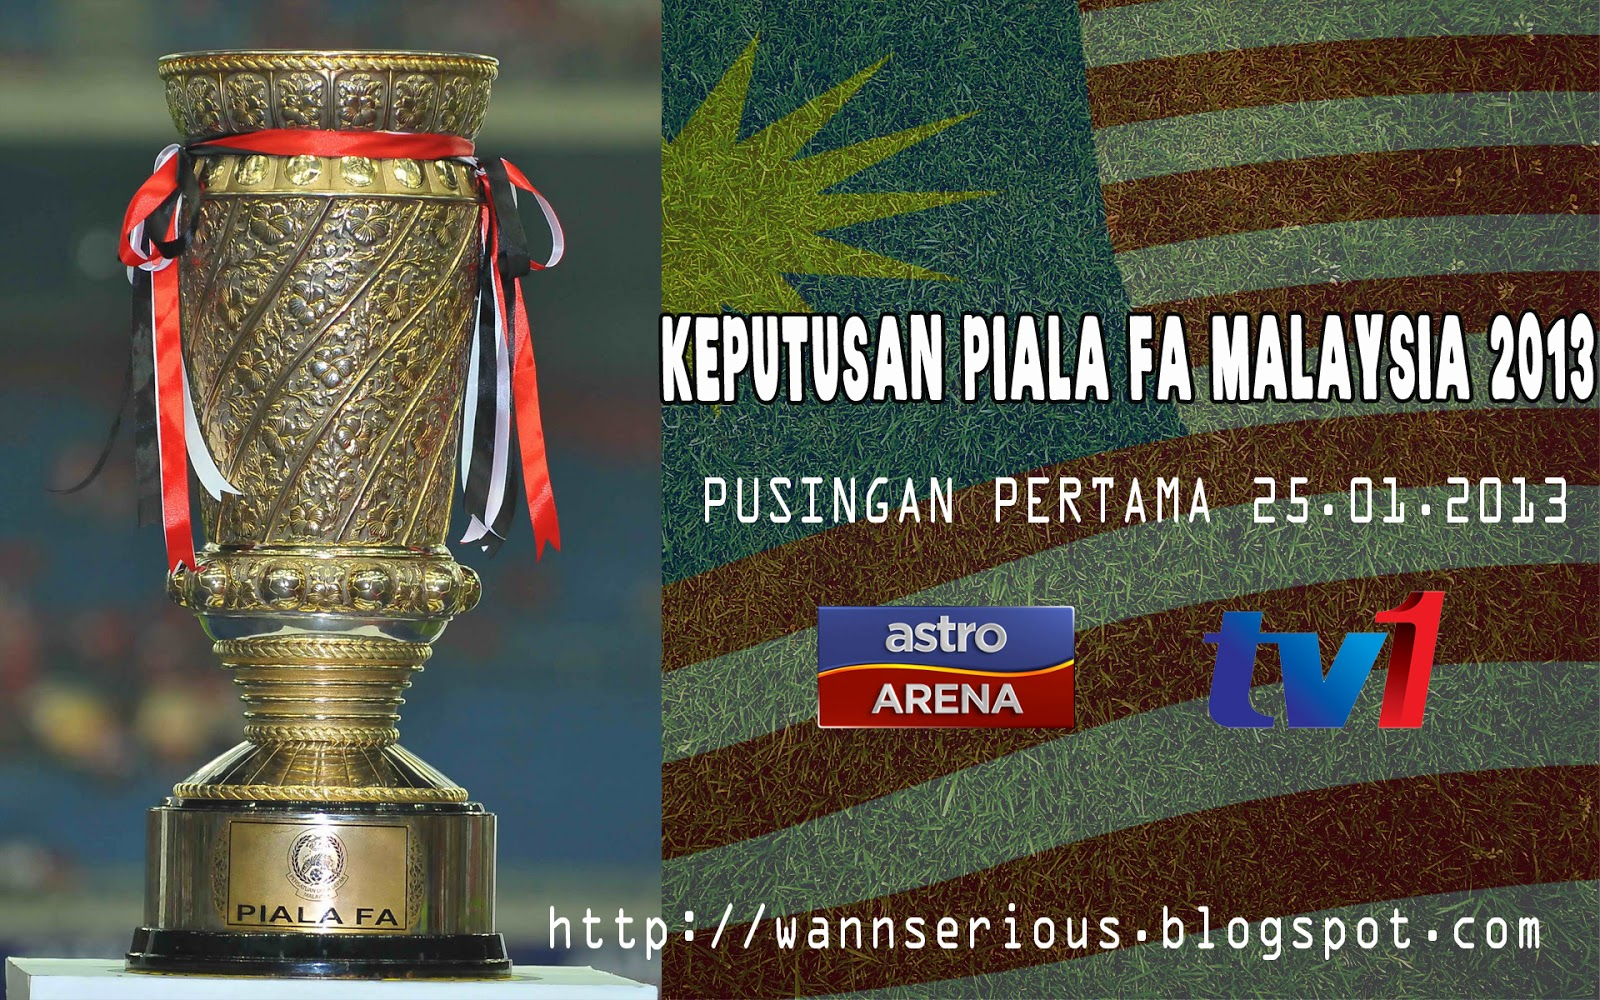 Home > Sukan > Keputusan Terkini Piala FA Malaysia 25 Januari 2013